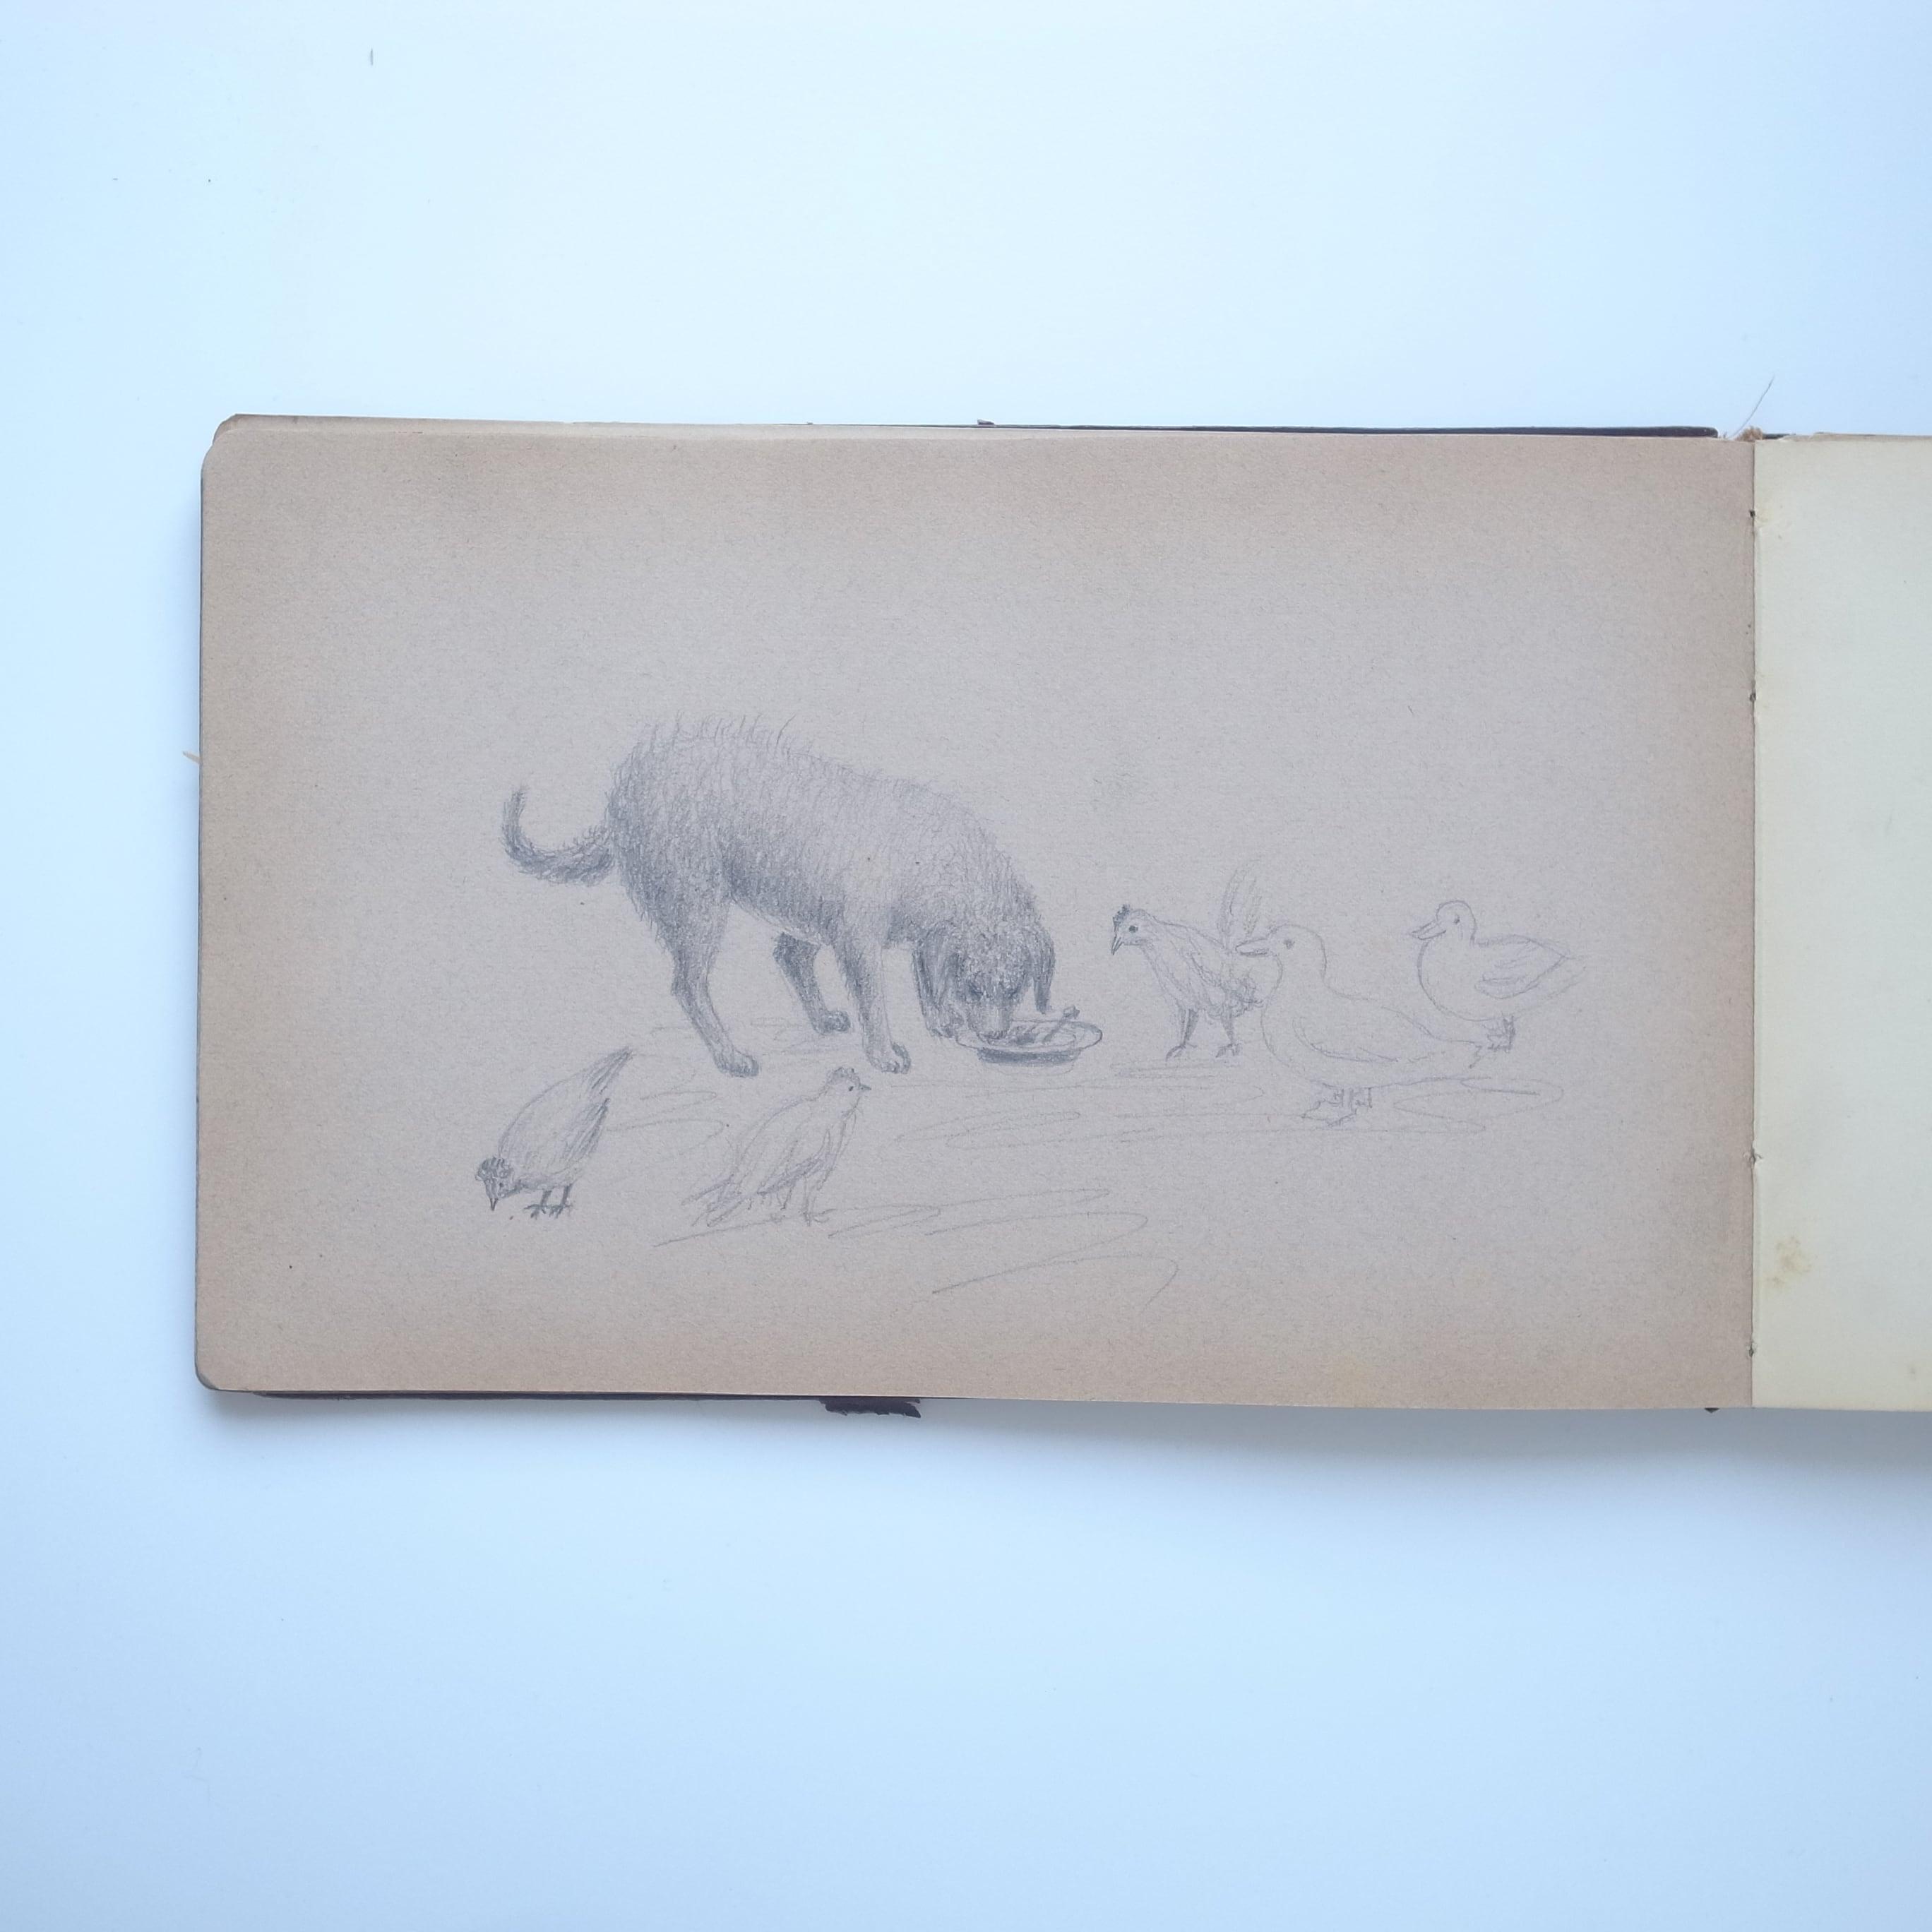 Gunilda Kolthoff's Sketch book